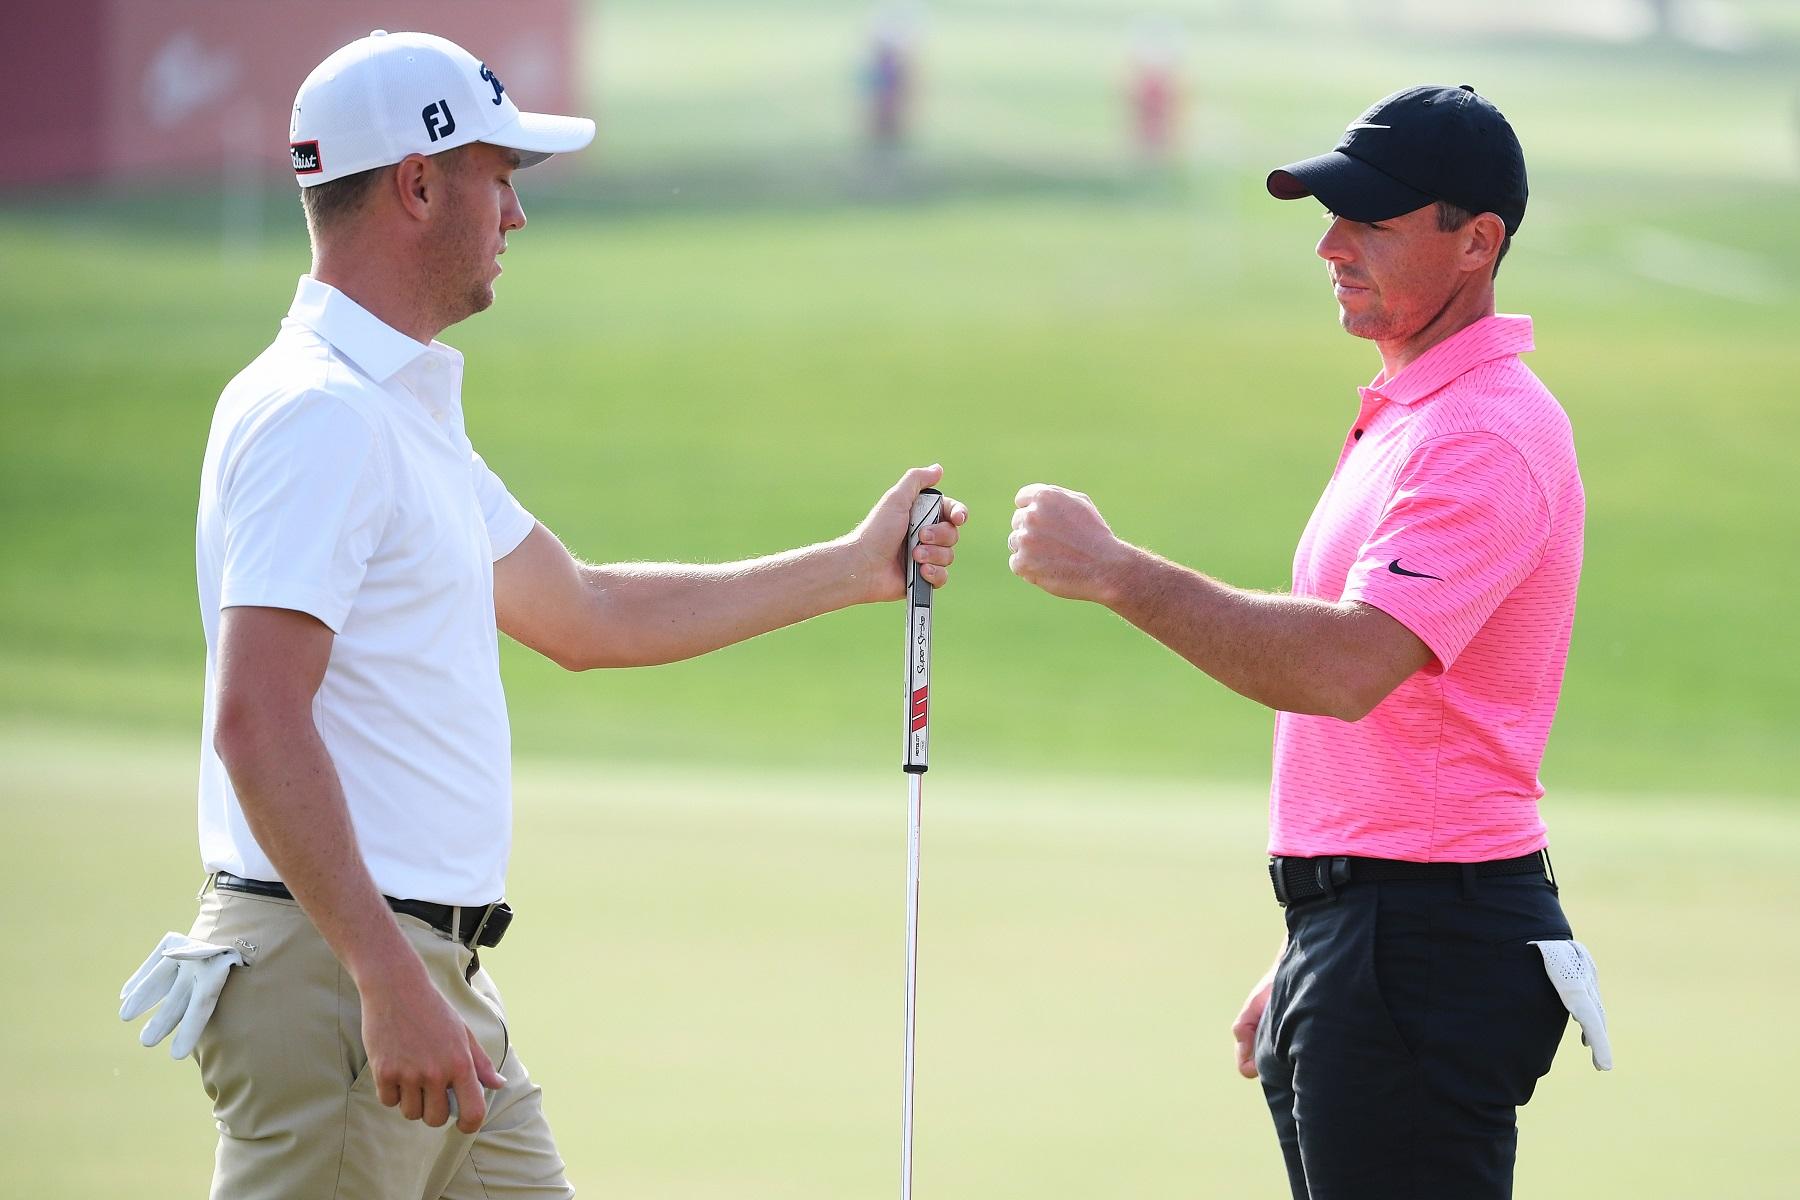 Justin Thomas Is Still 'a Great Guy' Despite the Homophobic Slur, a PGA Rival Insists